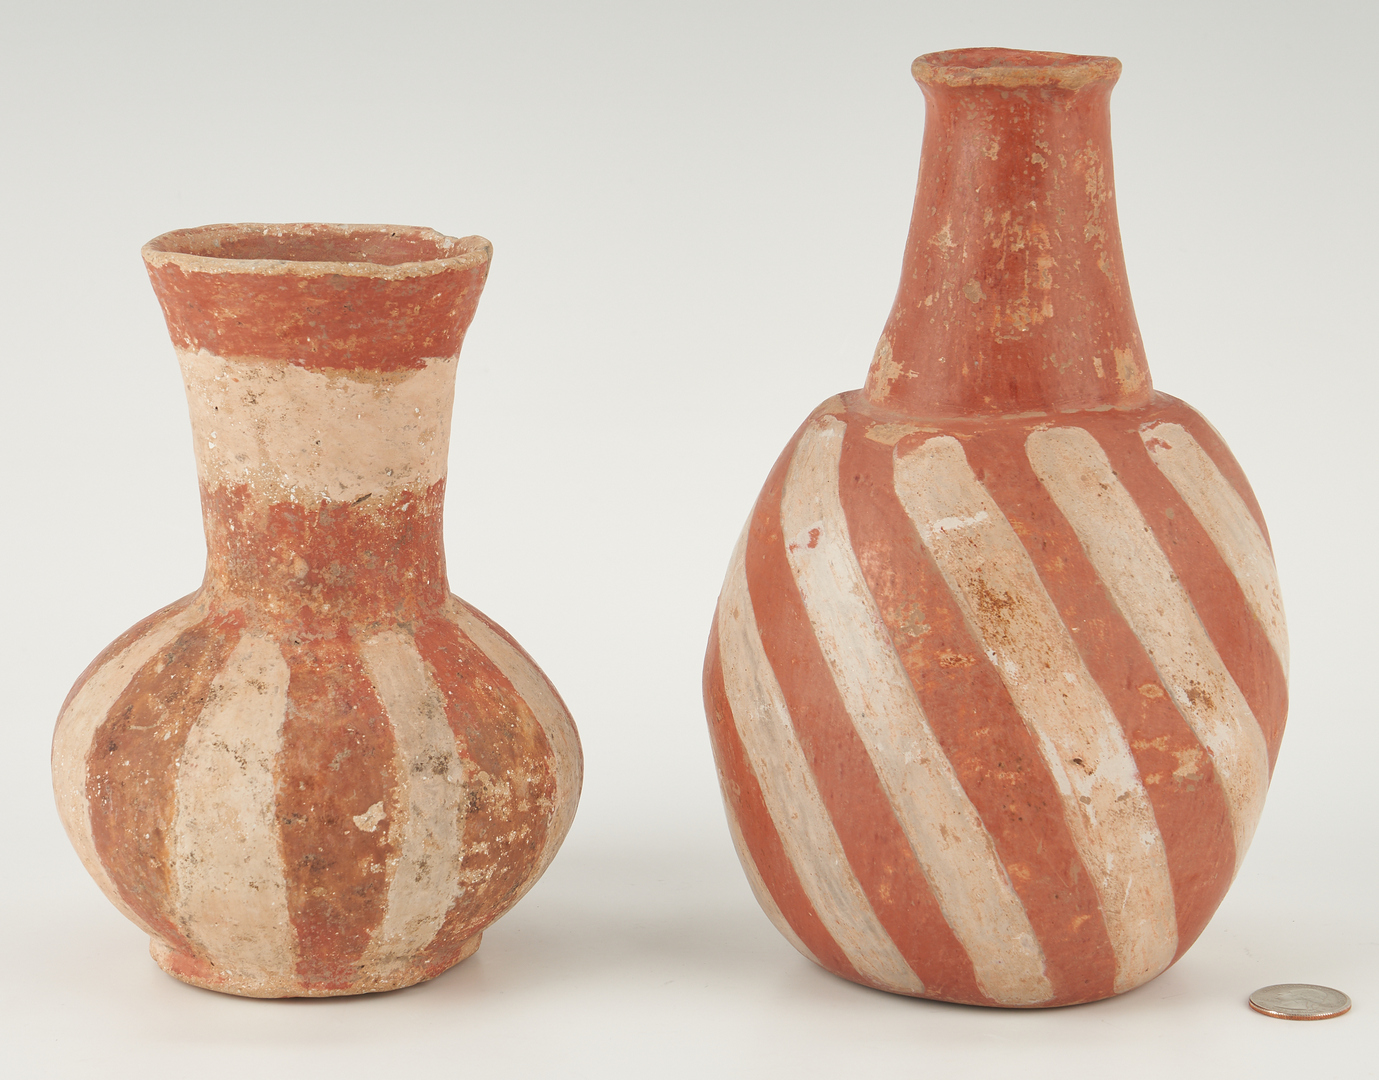 Lot 680: 2 Quapaw Mississippian Culture Pottery Items